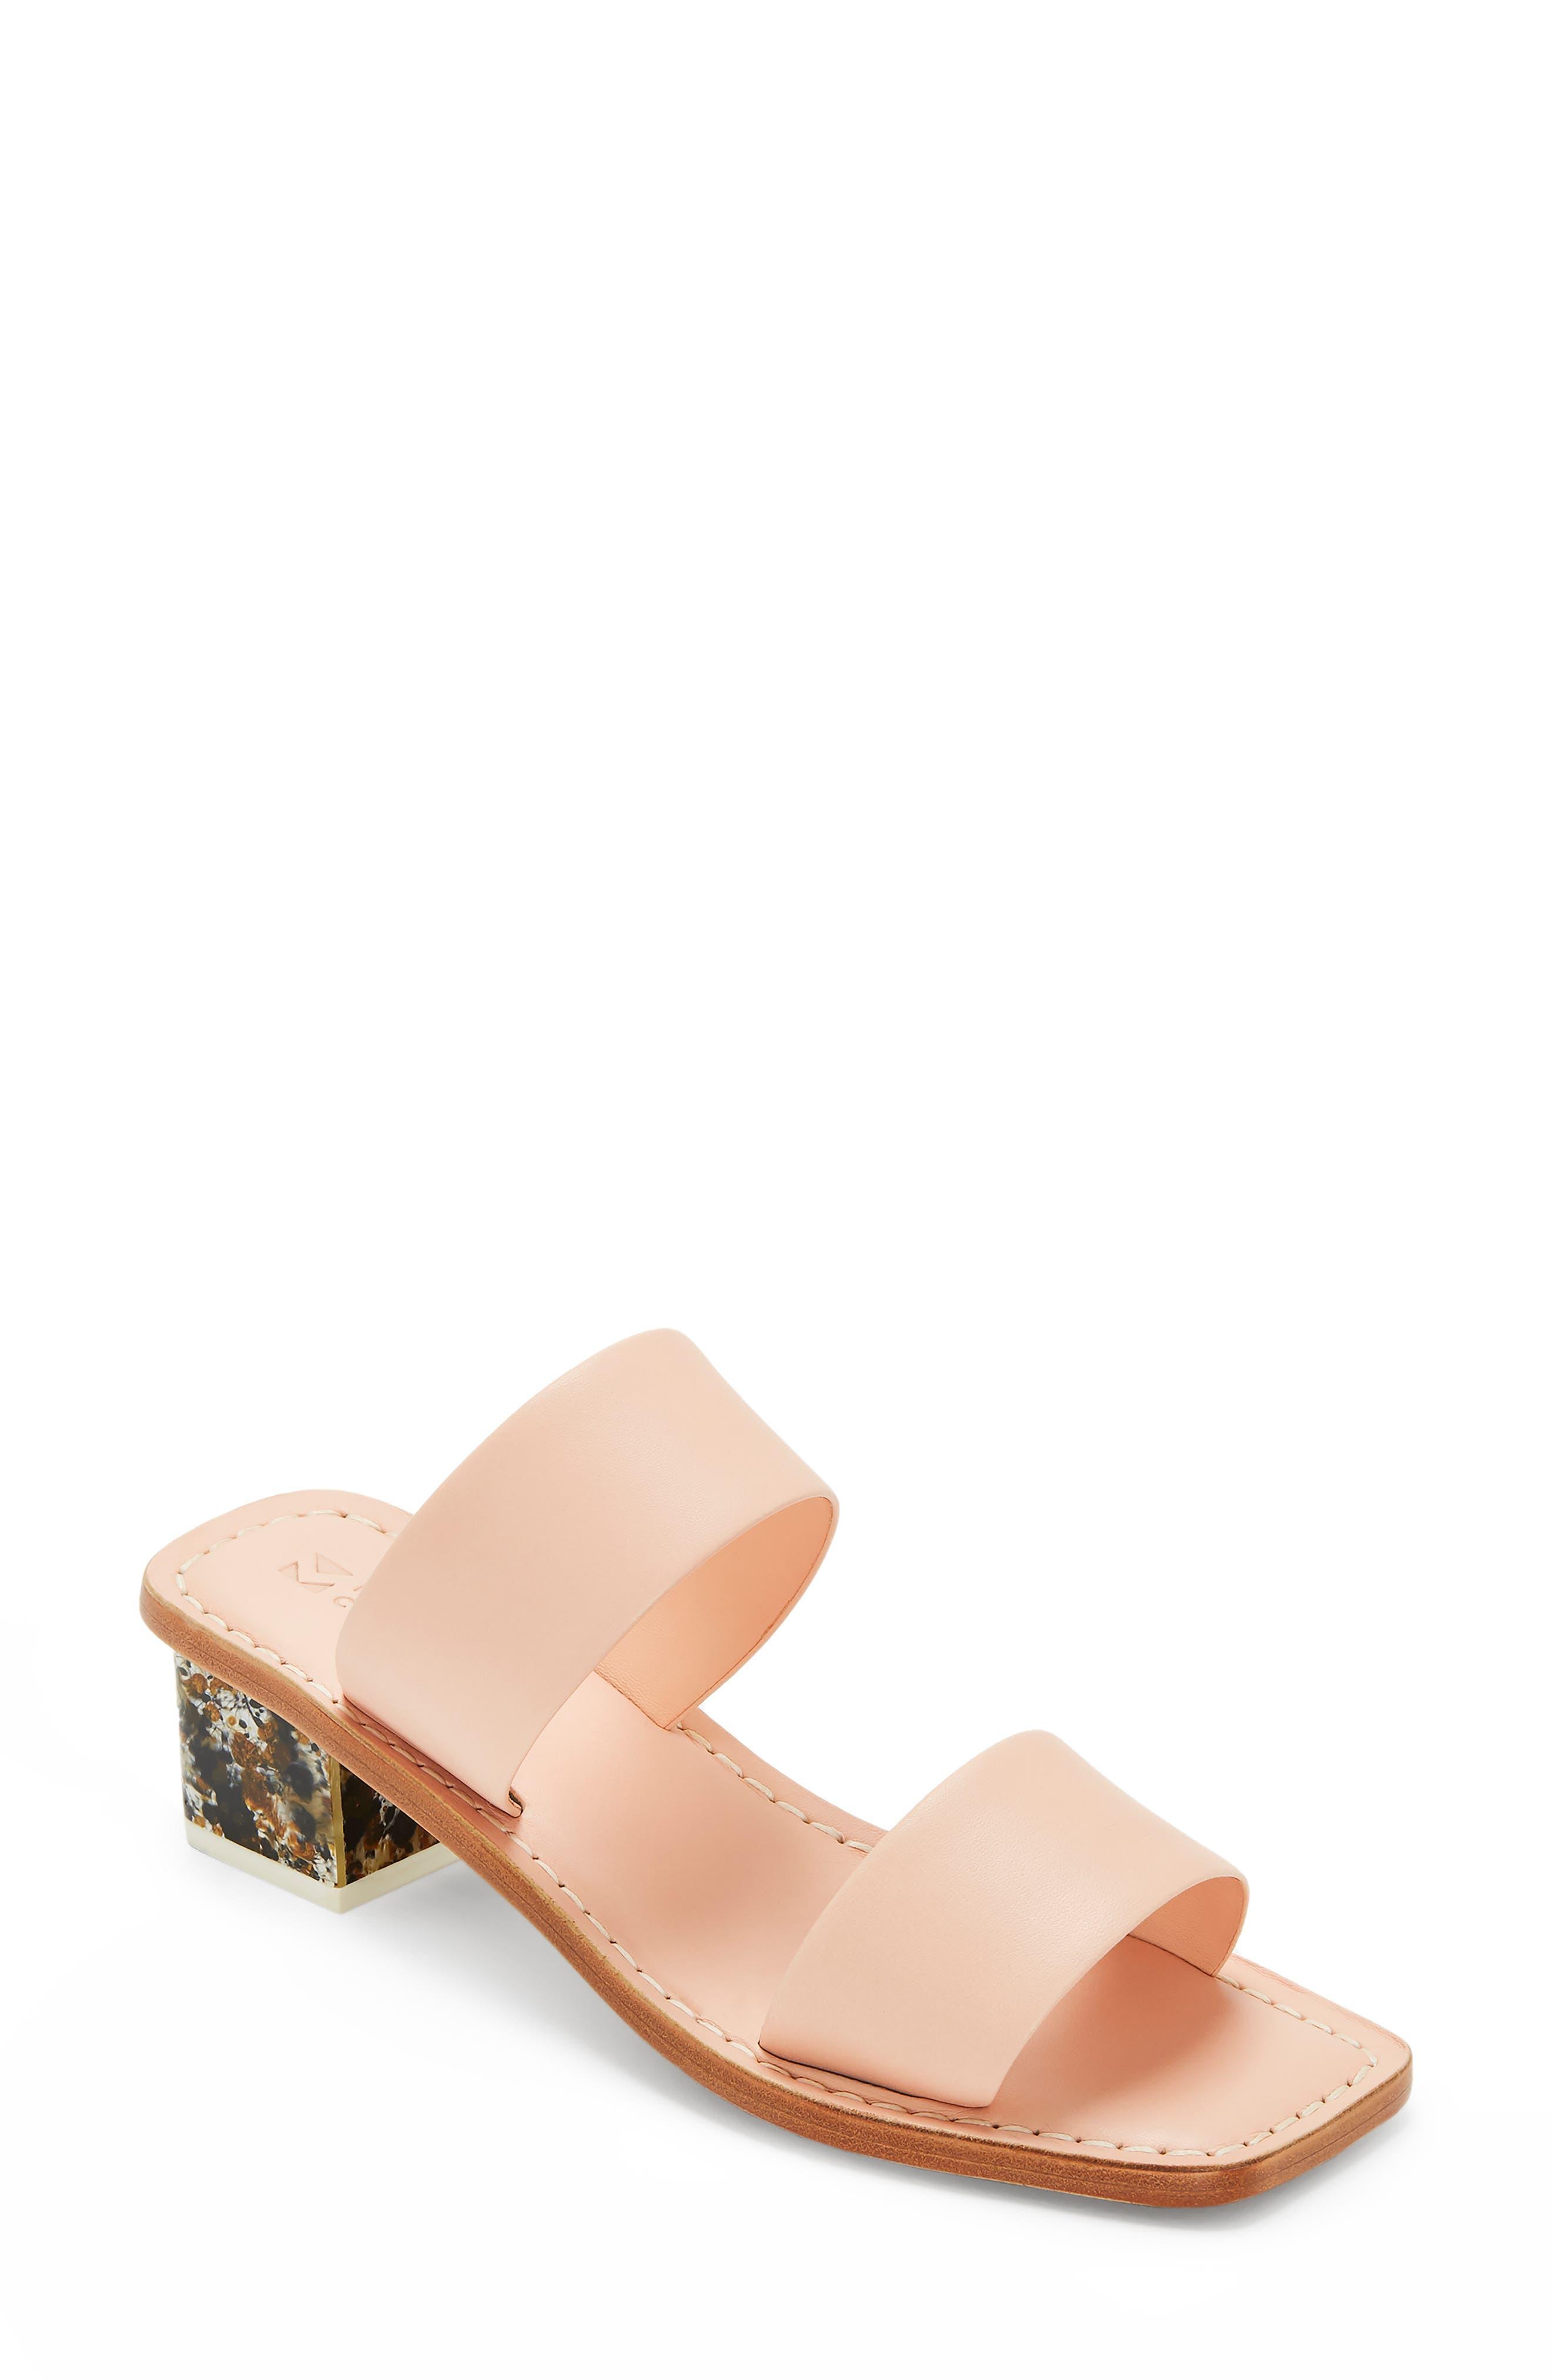 Mercedes Castillo Lavina Slide Sandal, Pink